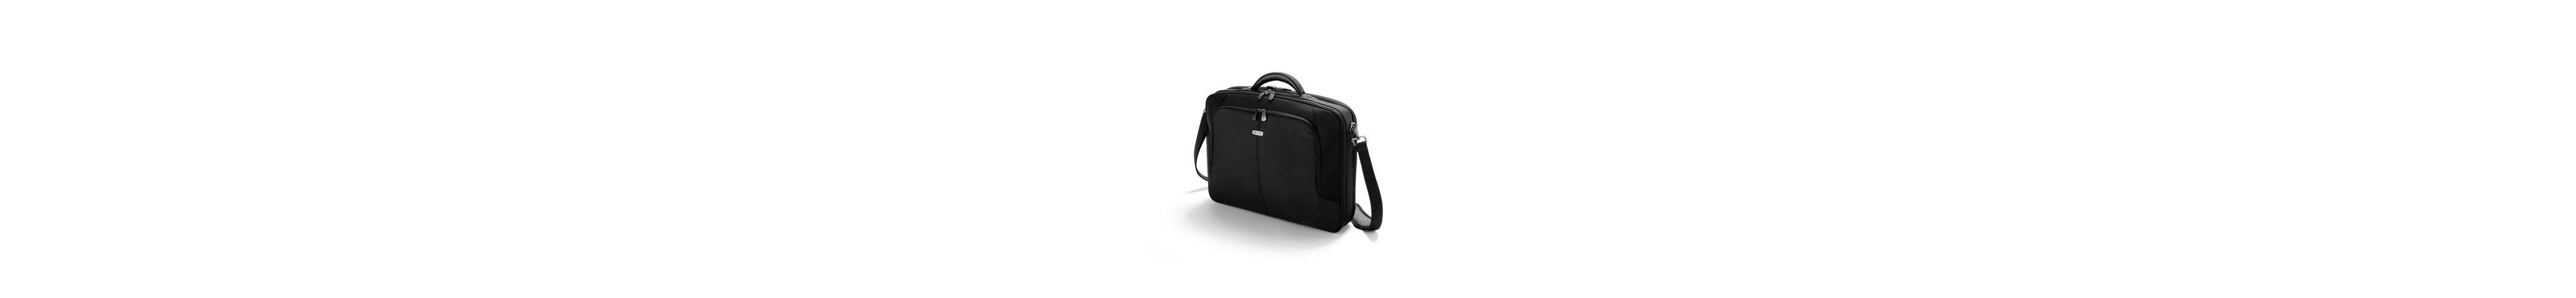 DICOTA Kompakte Notebooktasche »MultiPlus 14-15.6 - 41,6cm (D30144)«